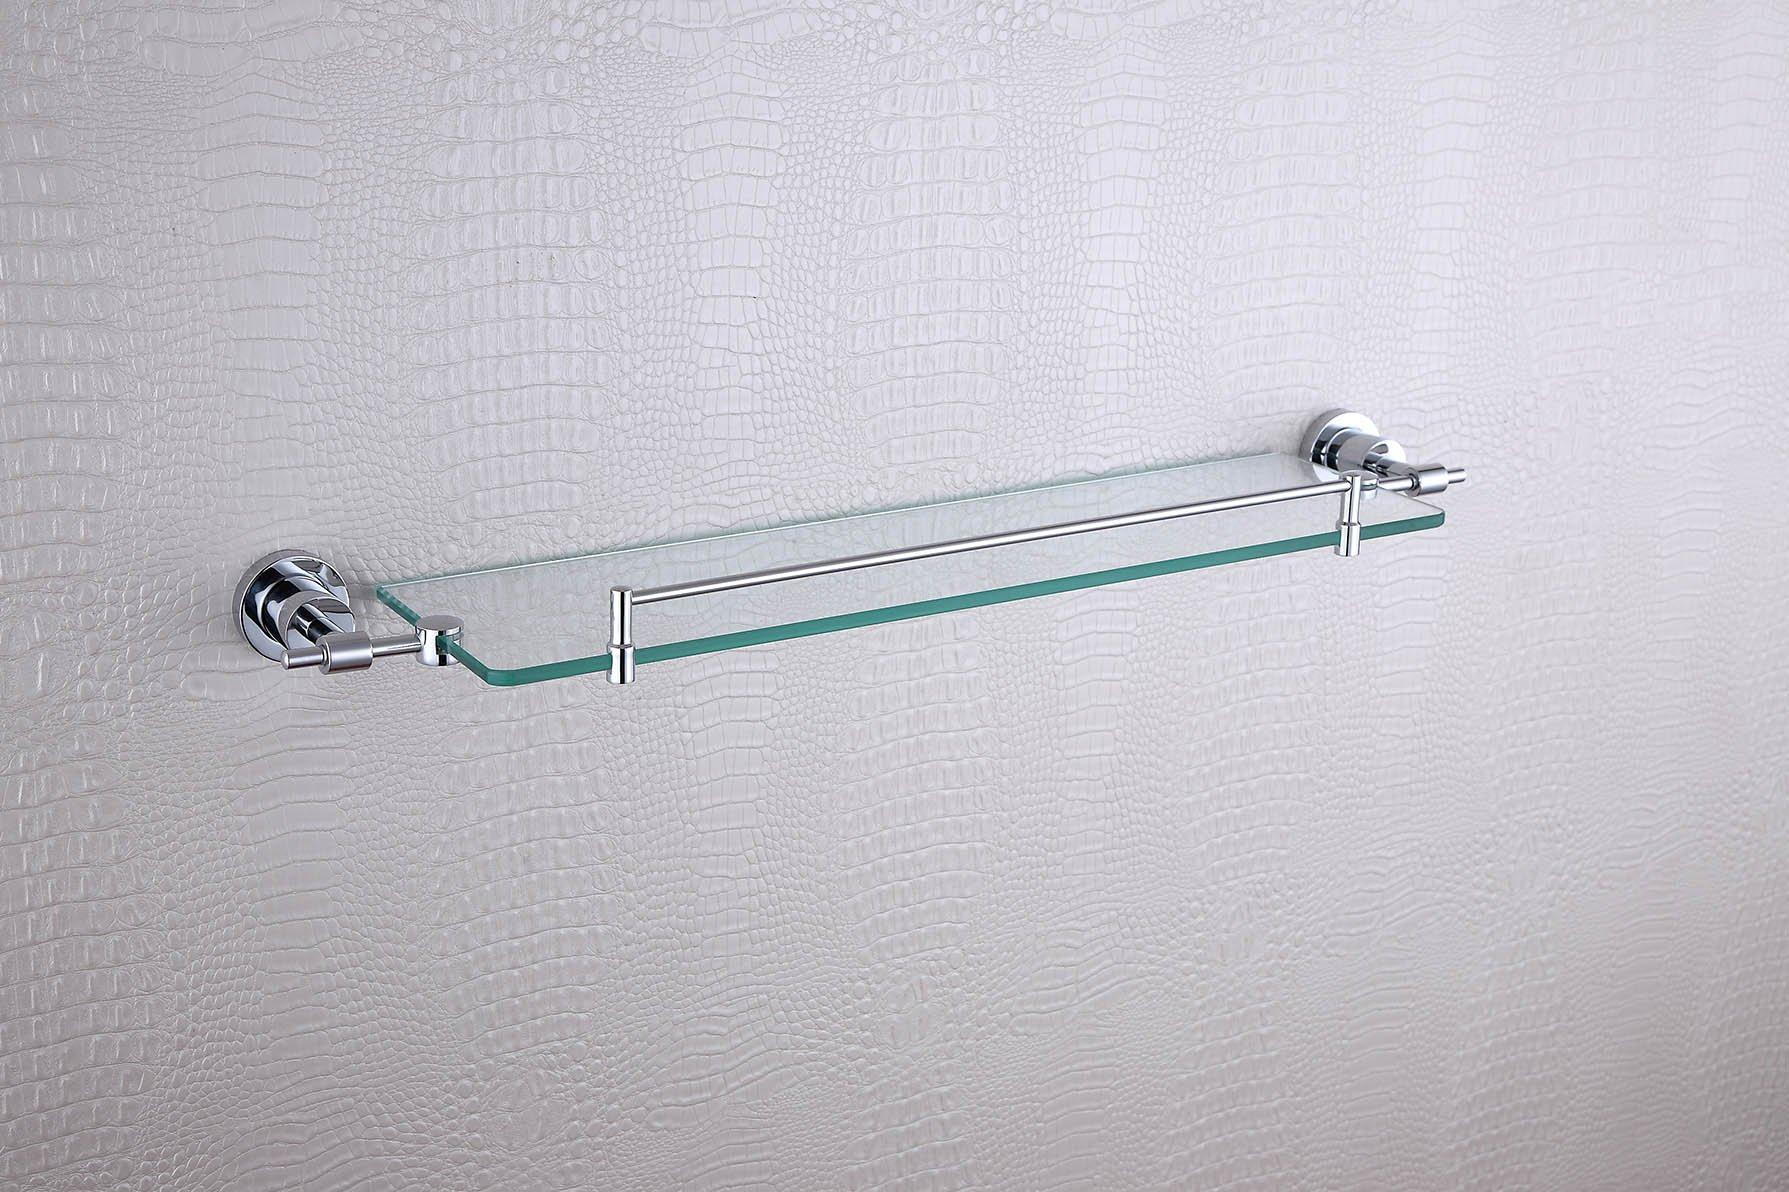 Cloud Power Wall-mounted Single Glass Shelves Brass Single Glass Shelves For Bathroom Single Glass Shelves With Chrome